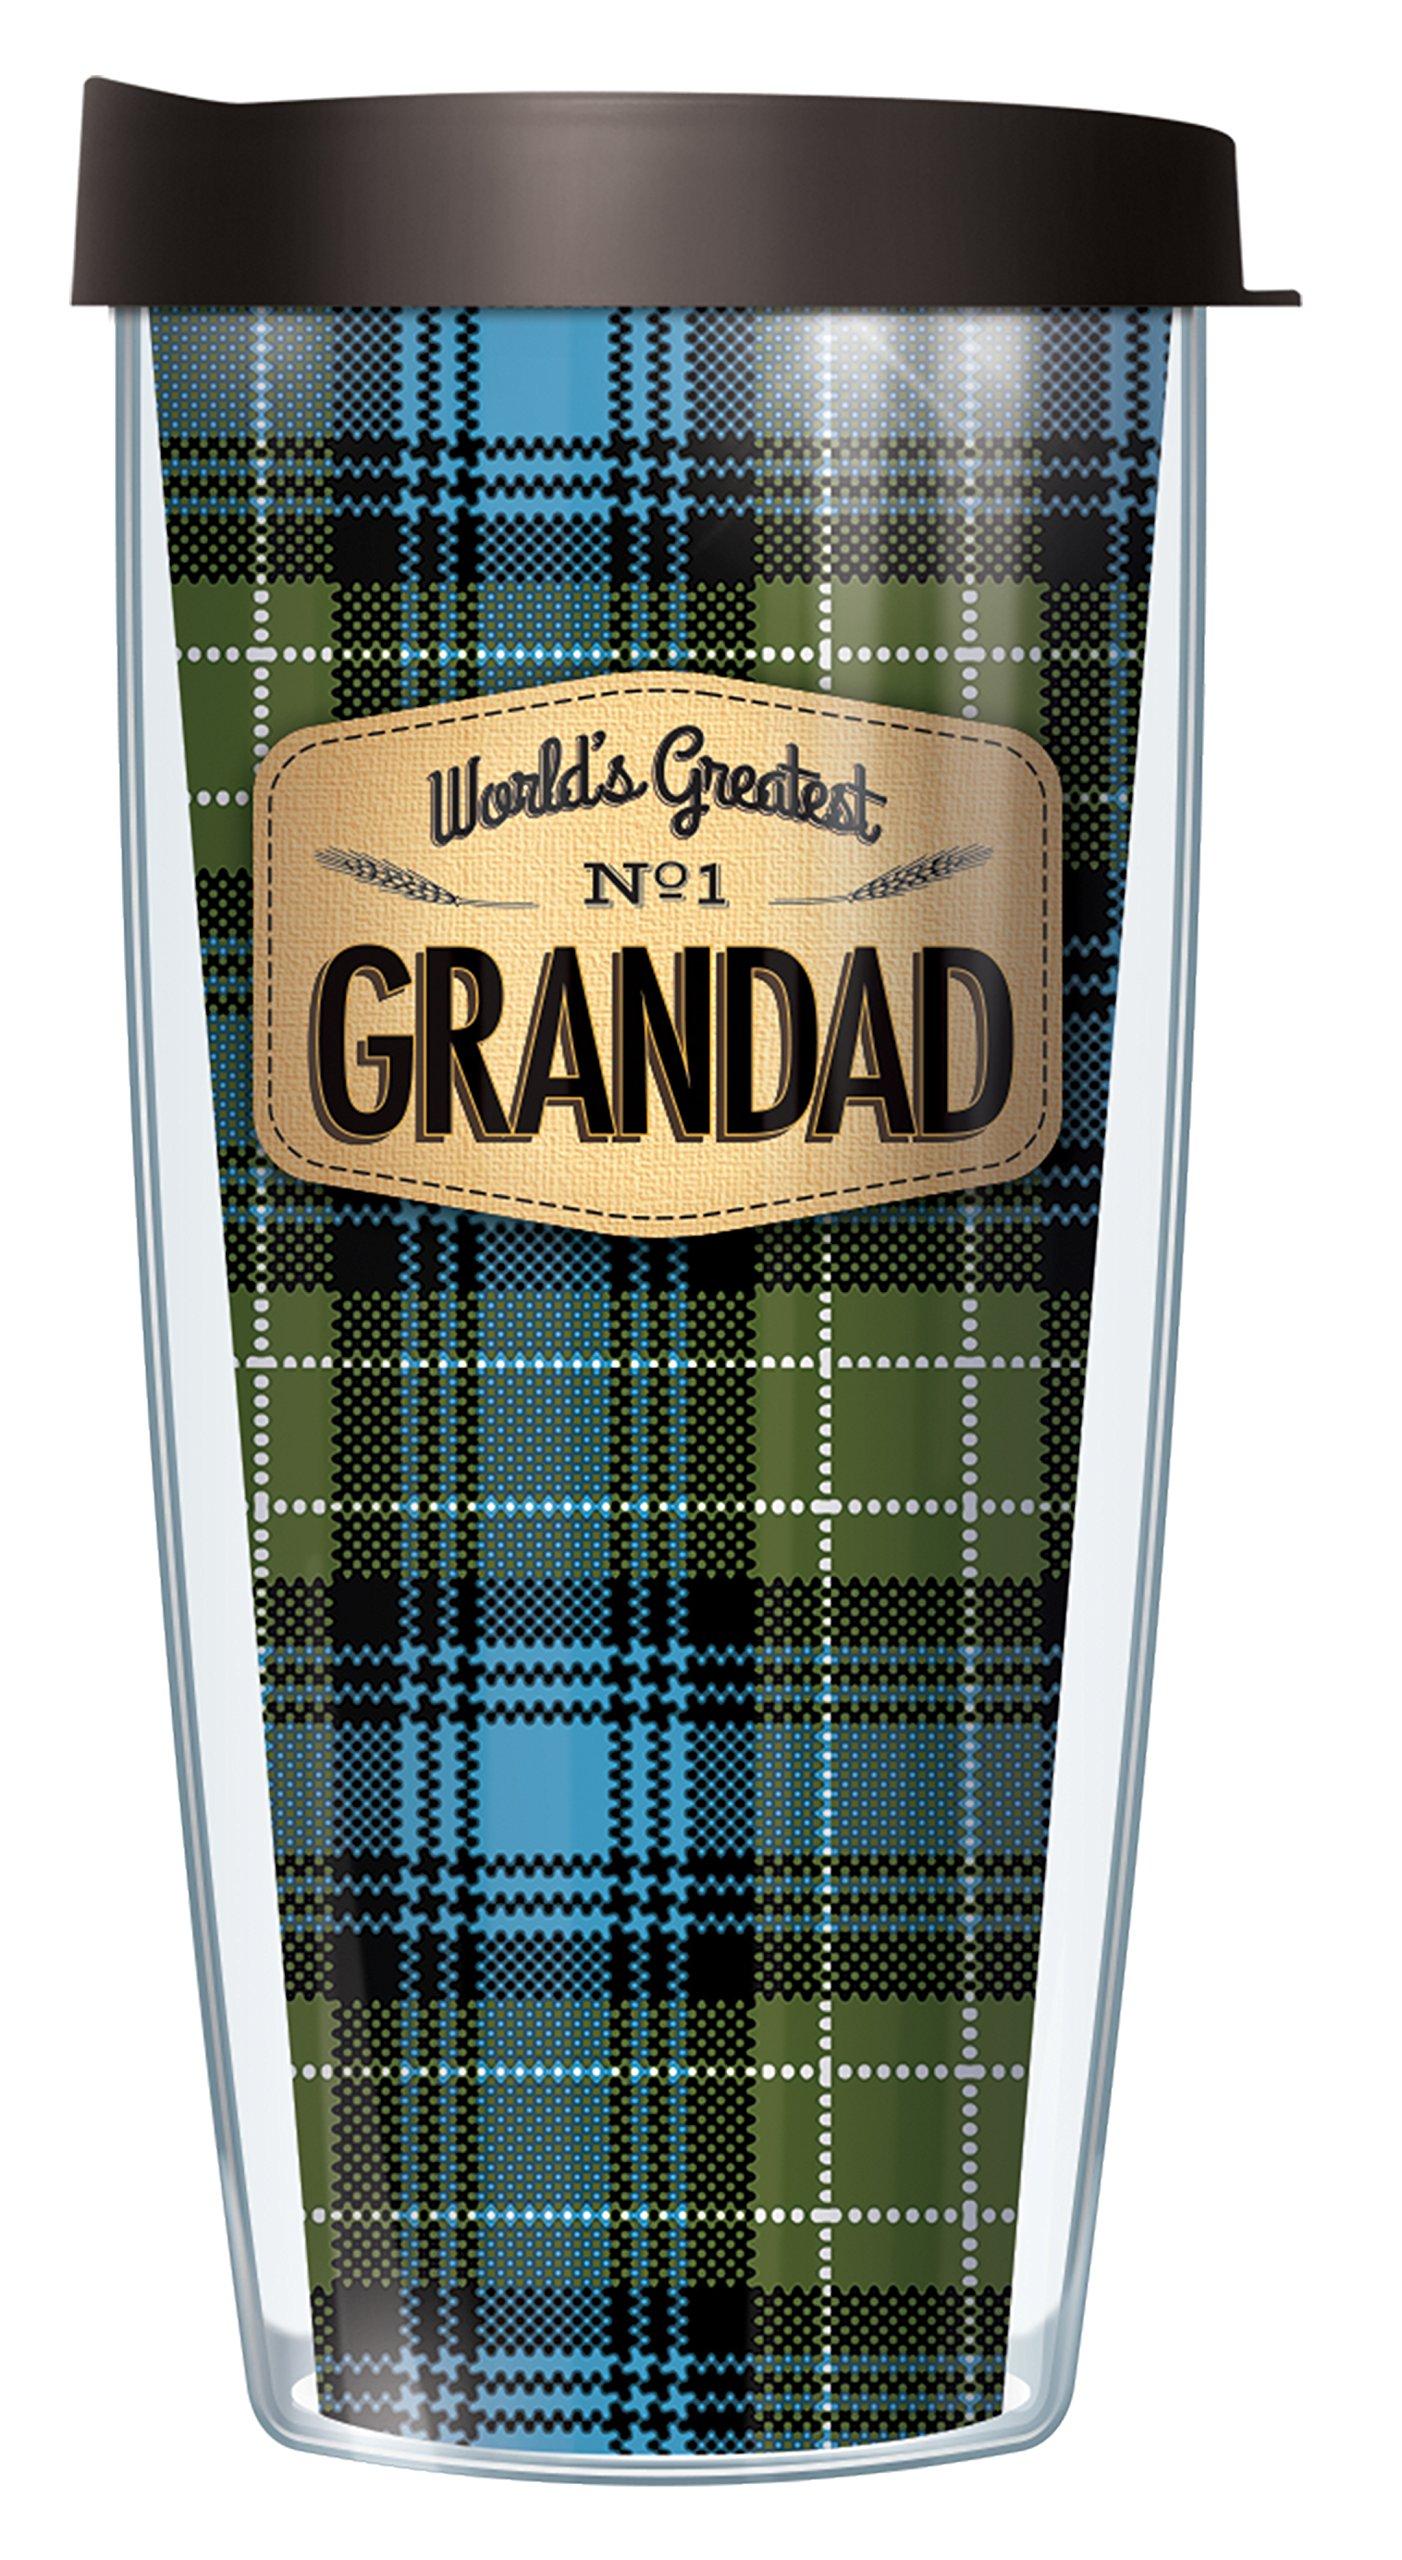 World's Greatest Grandad Blue Flannel Design 16 Oz Traveler Tumbler Mug with Lid